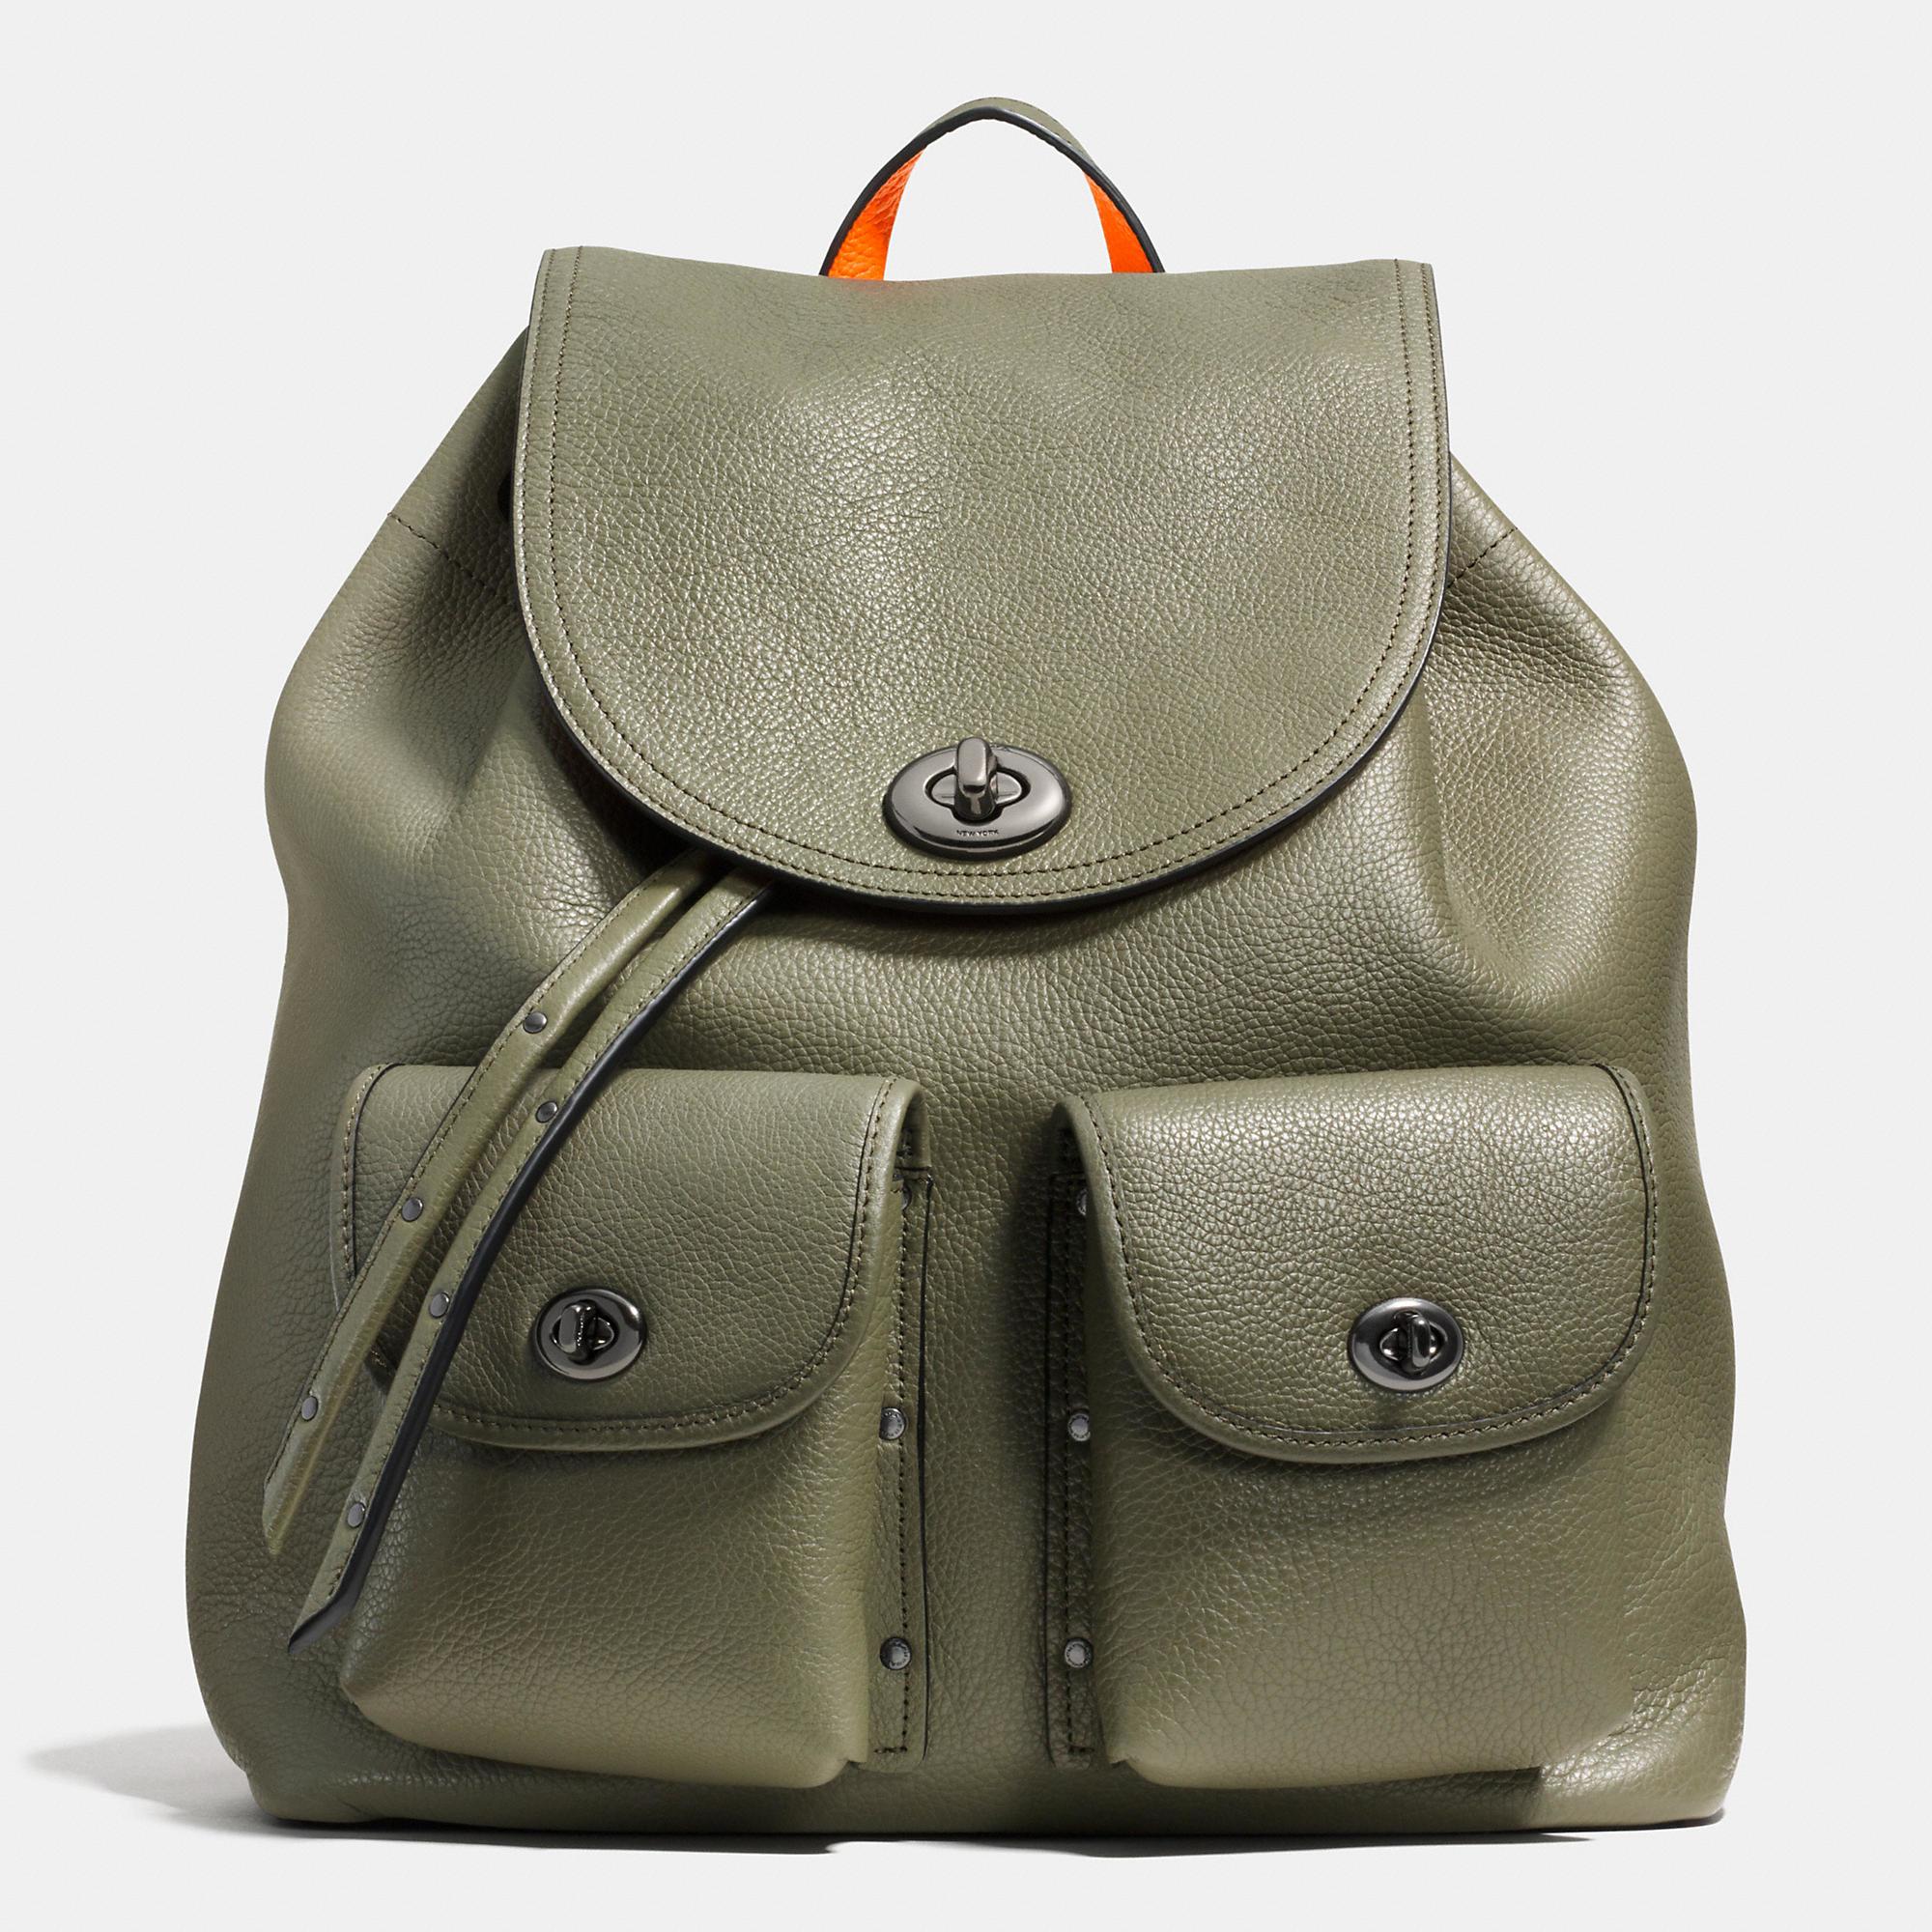 f2d675488073 denmark turnlock. coach turnlock edie shoulder bag in polished pebble  leather c45c0 ea76e